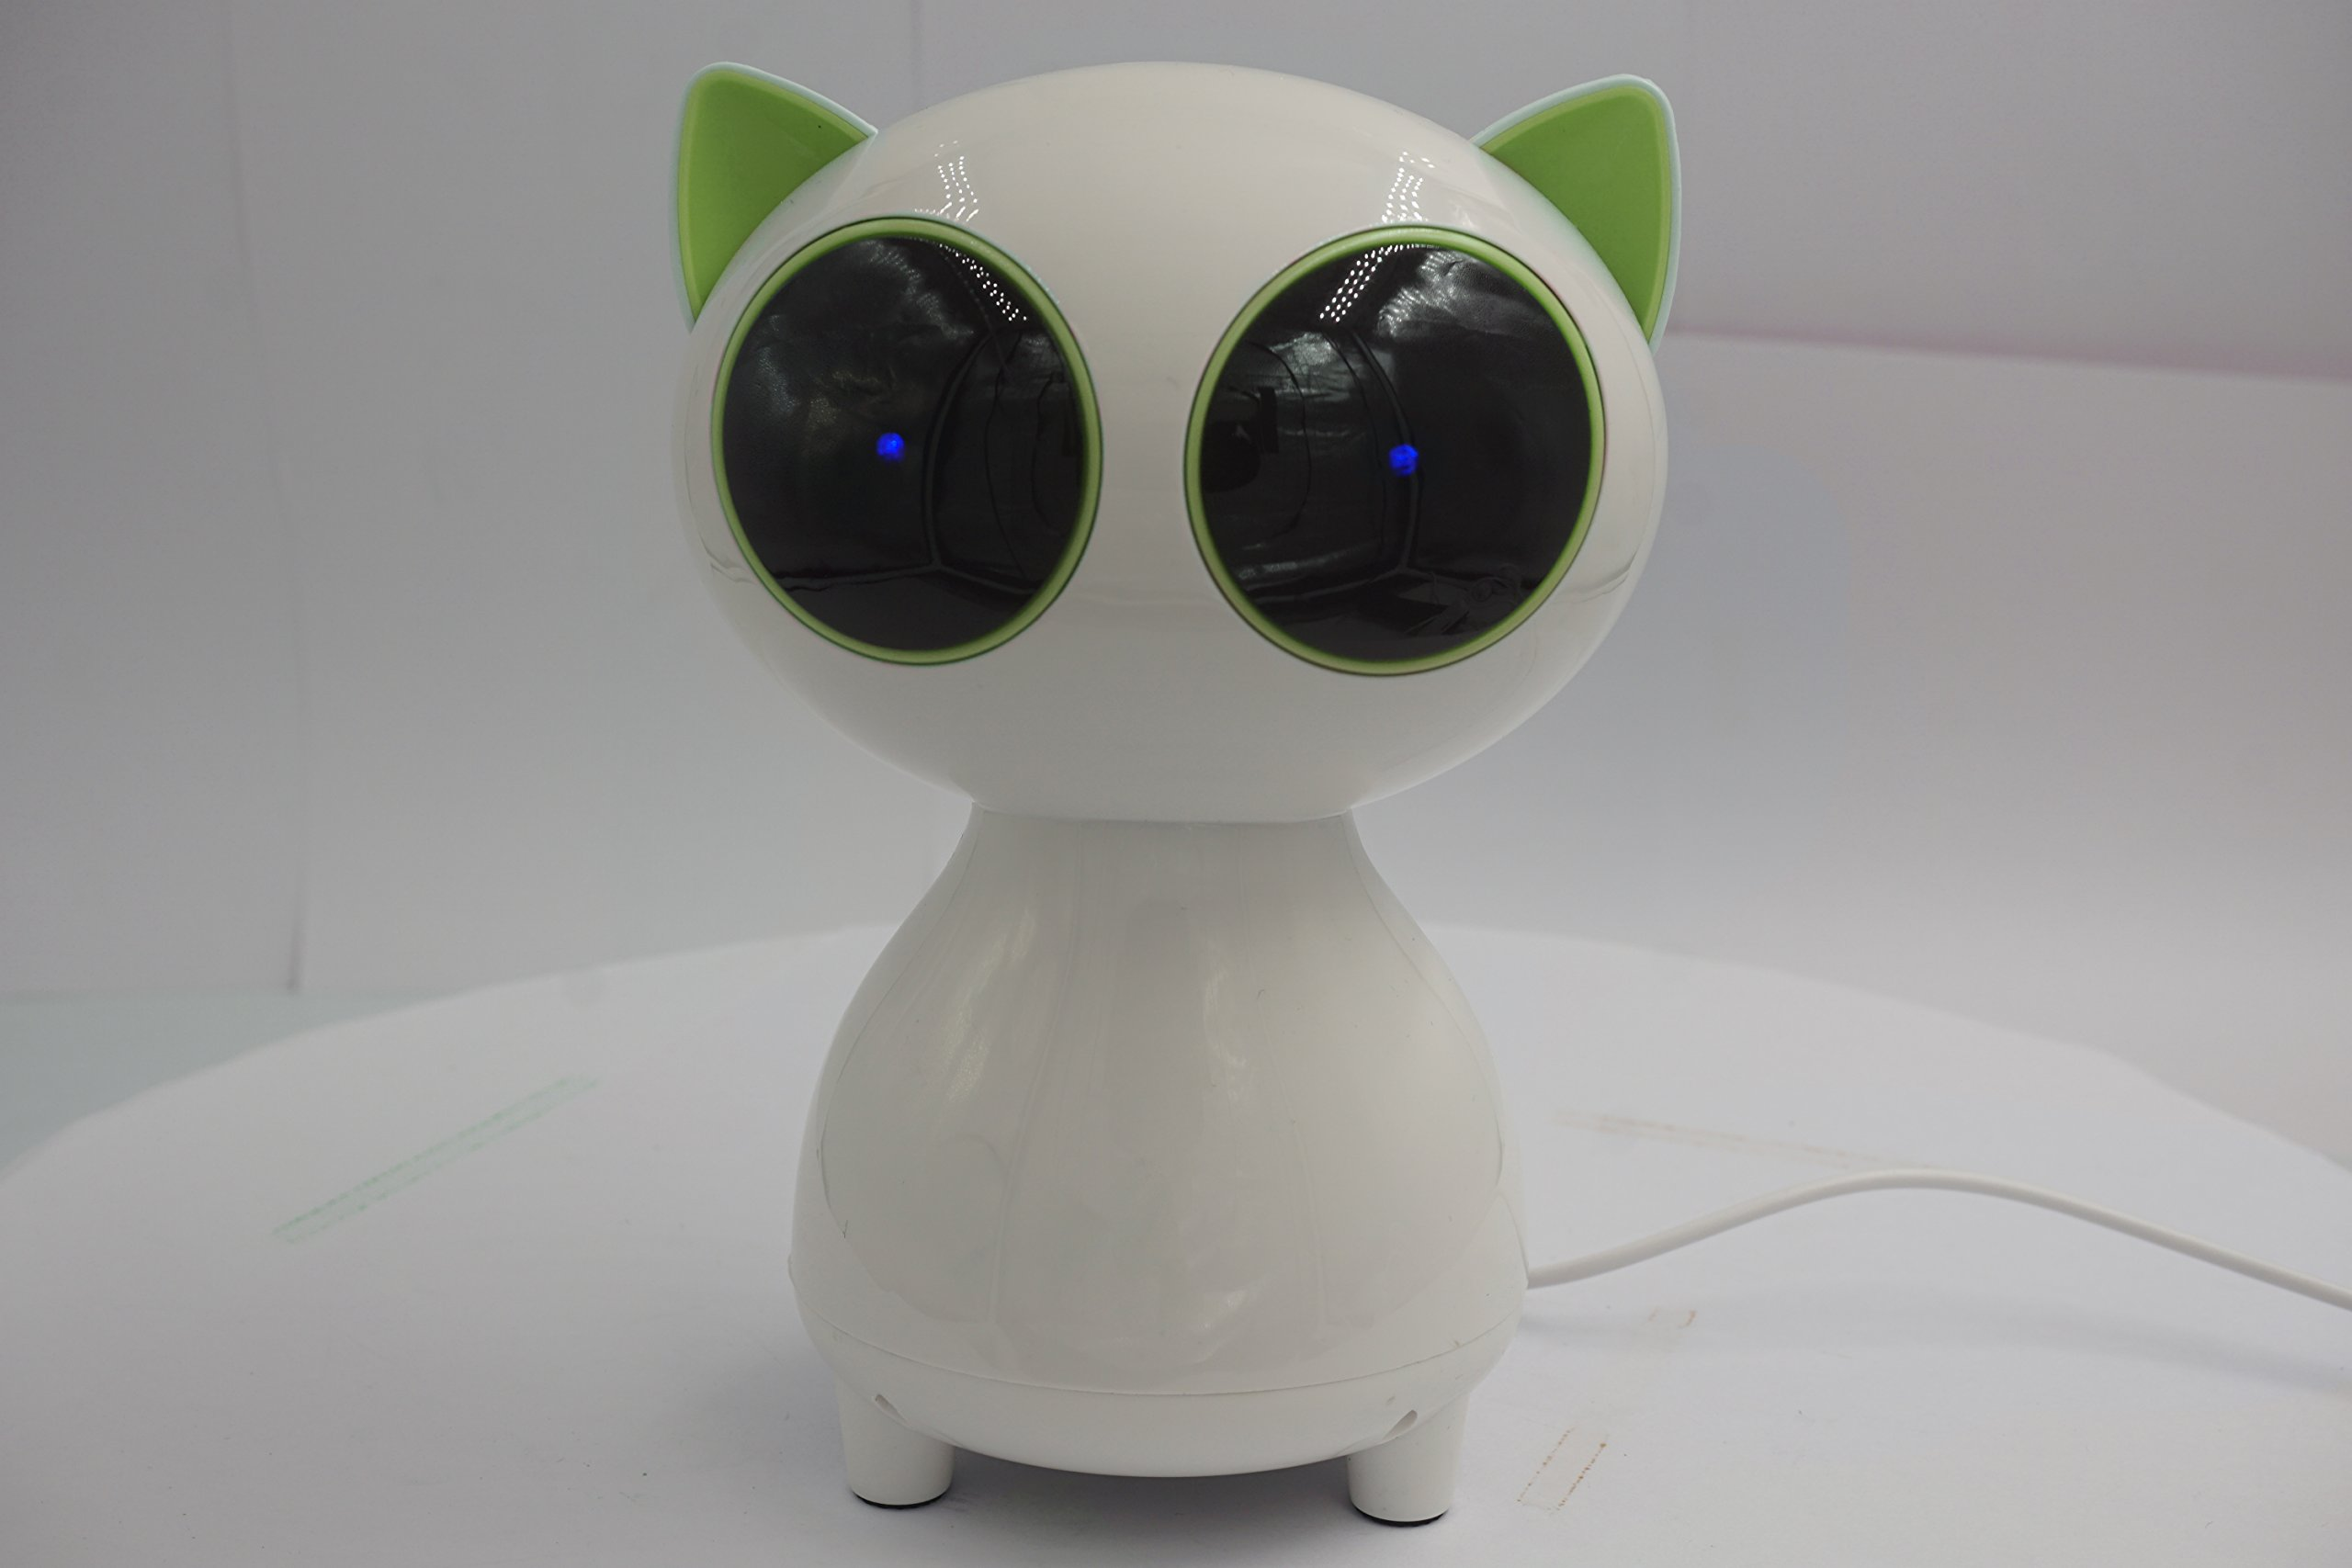 Cat USB Speaker- Wired Speaker 2.0 Channel Small Computer Desktop phone Speaker for PC, Echo Dot, Updated Version- WEIYATS (green) by WEIYATS (Image #2)